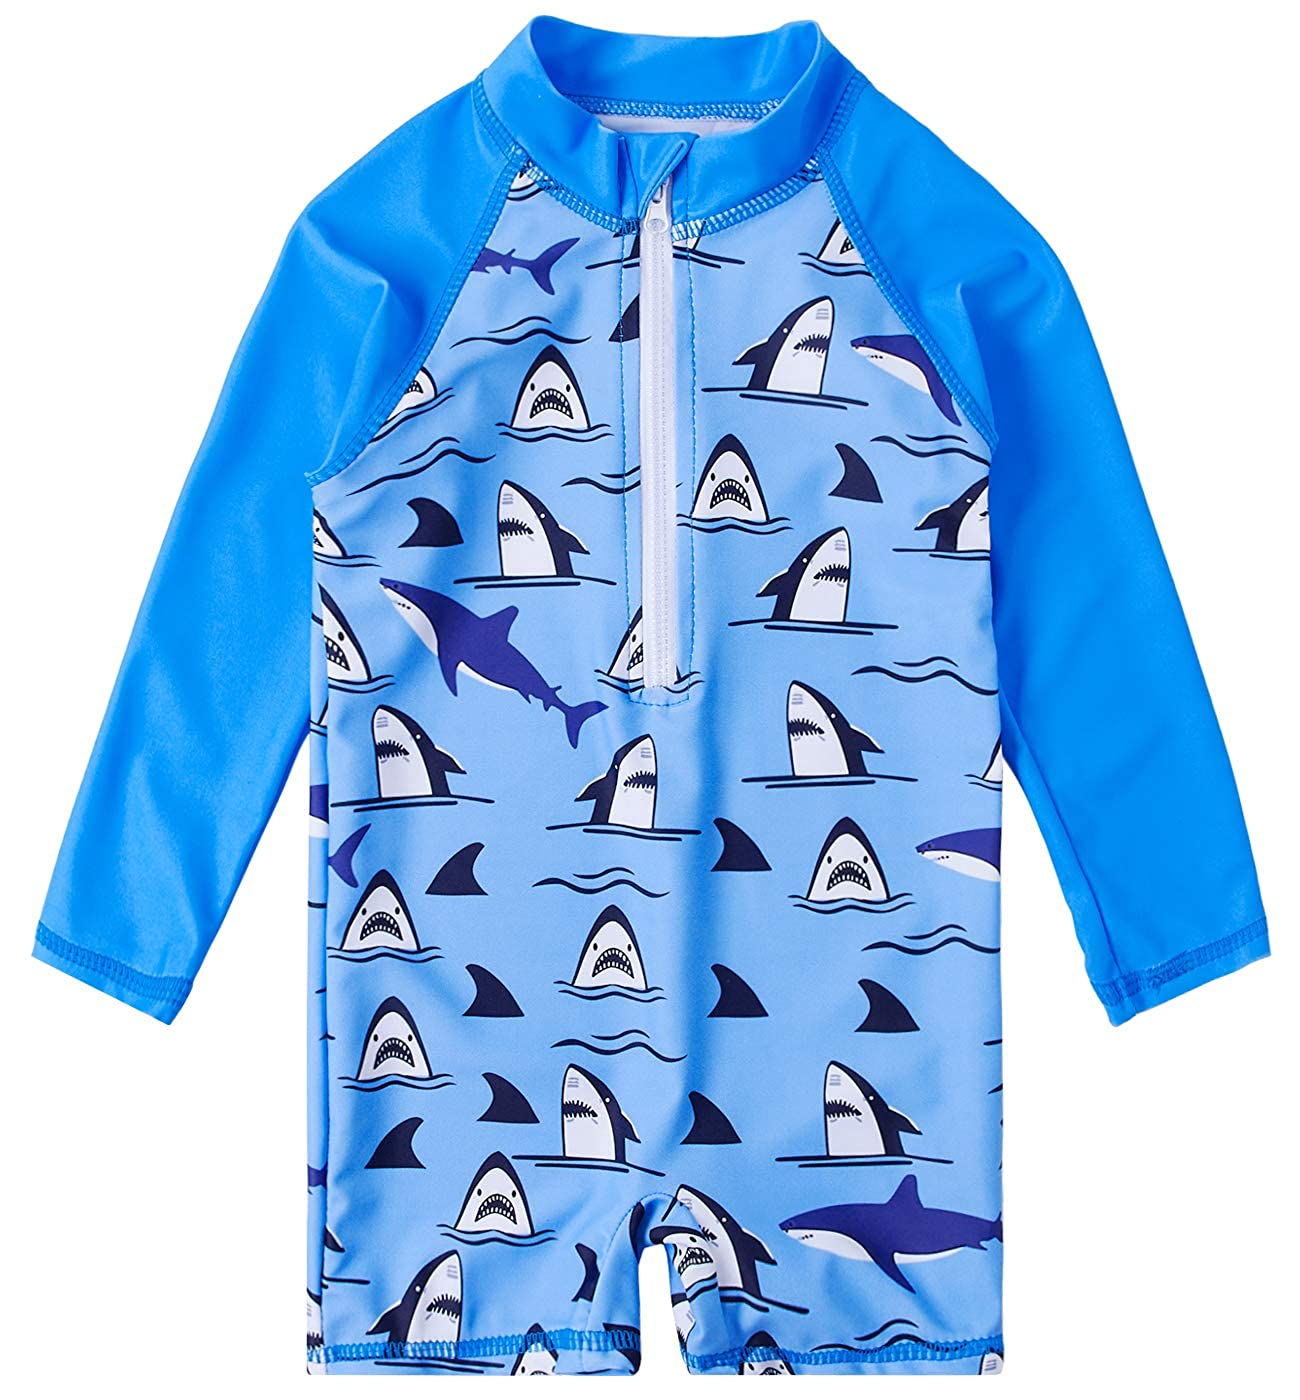 Uideazone Baby Toddler Boys Girls Zipper Rash Guard Swimsuit with UPF 50+ One Piece Beach Swimwear Bathing Suits 6-36 Months